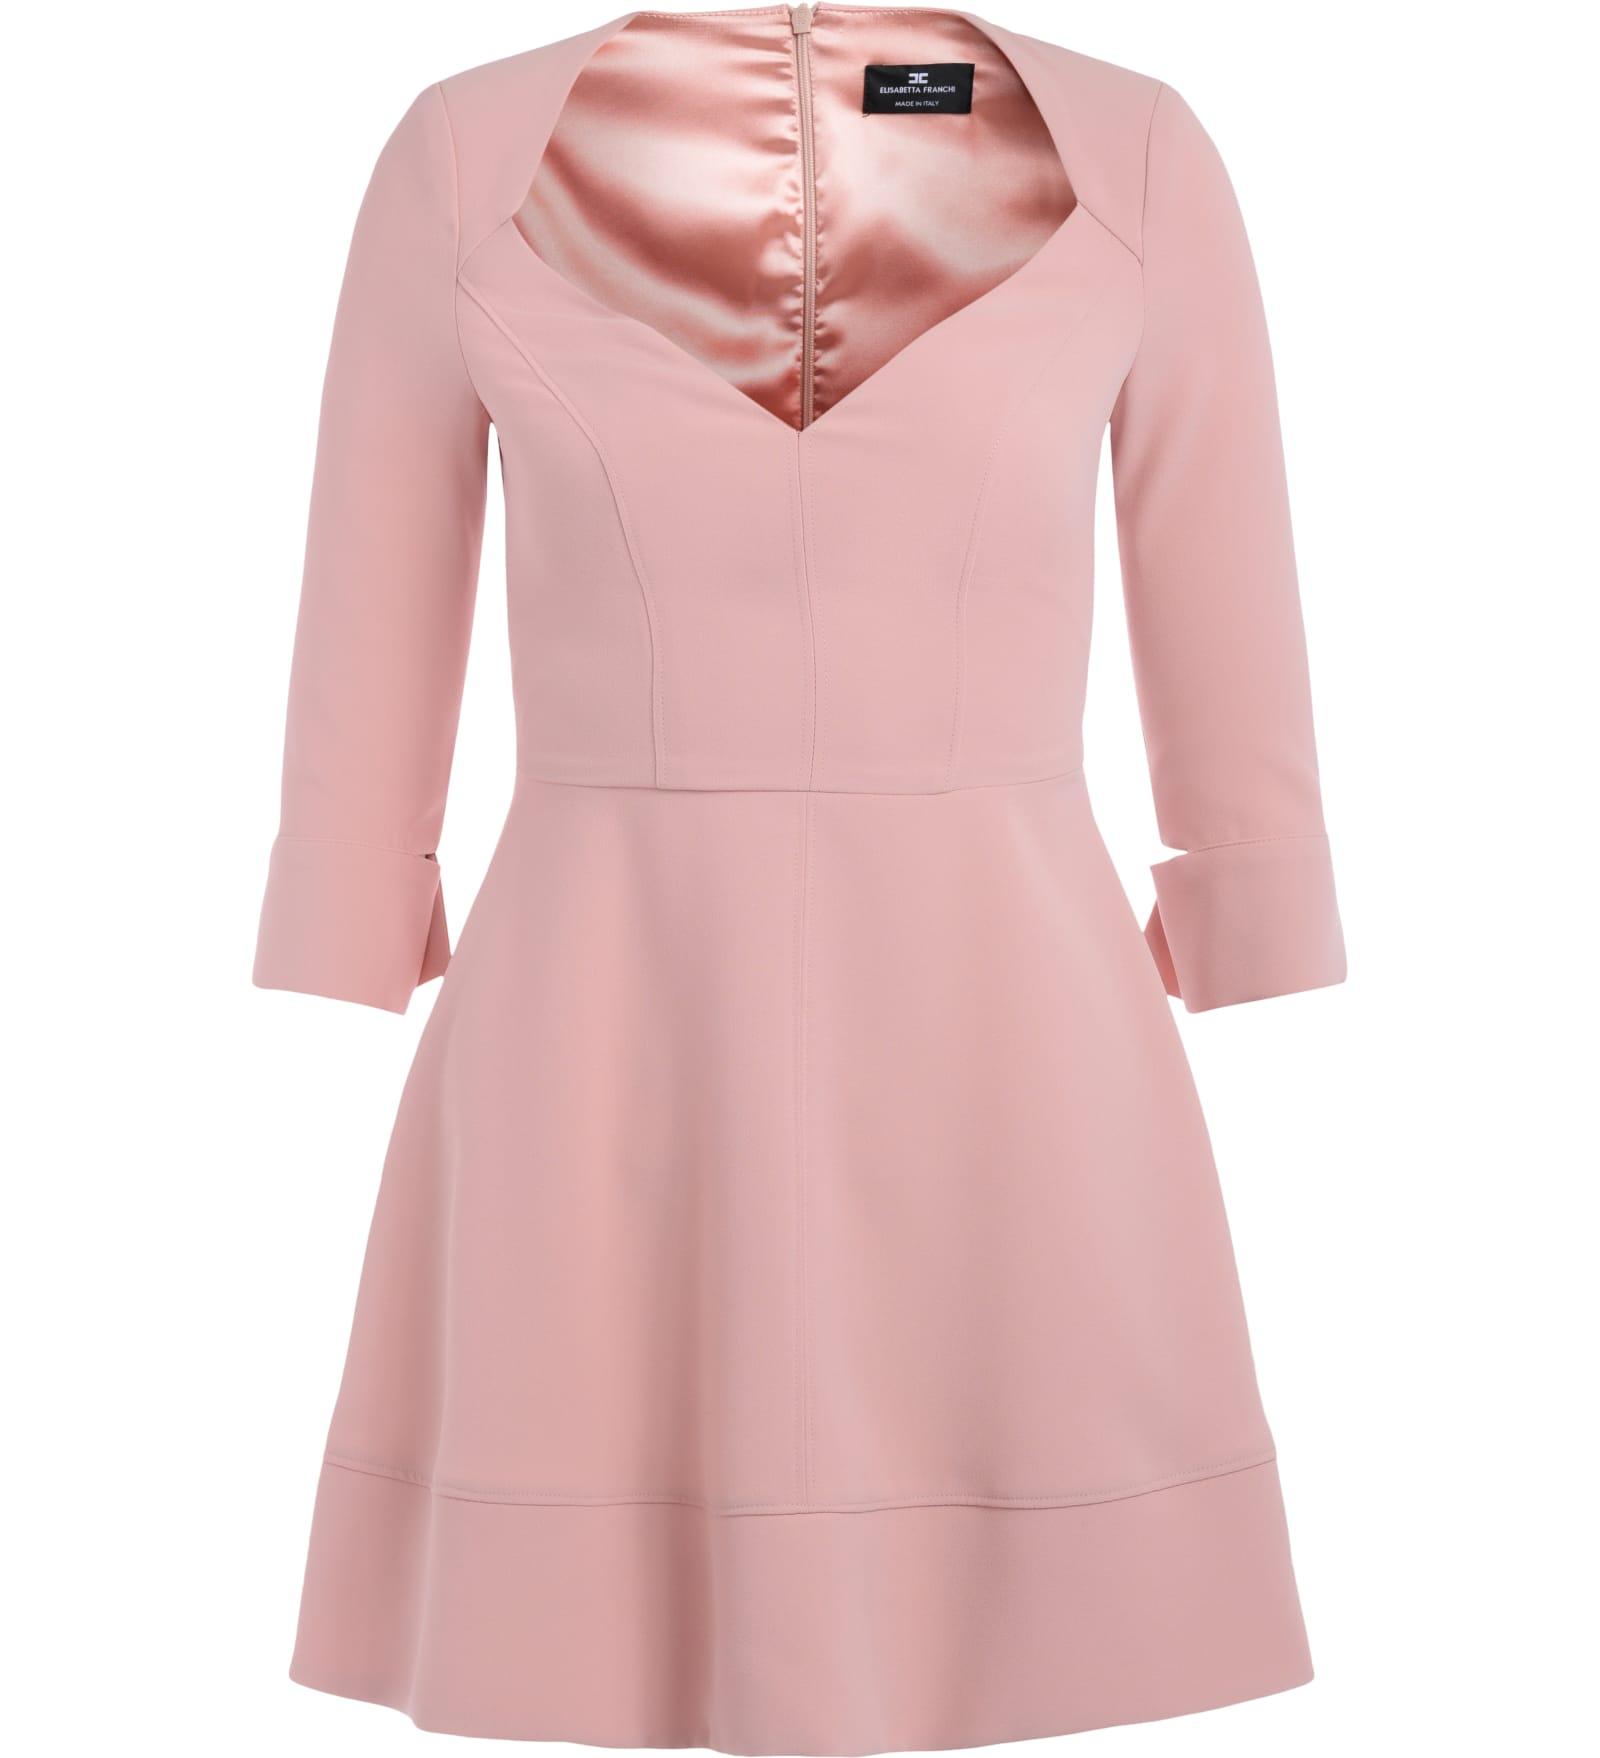 Elisabetta Franchi Antique Pink Dress With Low-cut Bodice